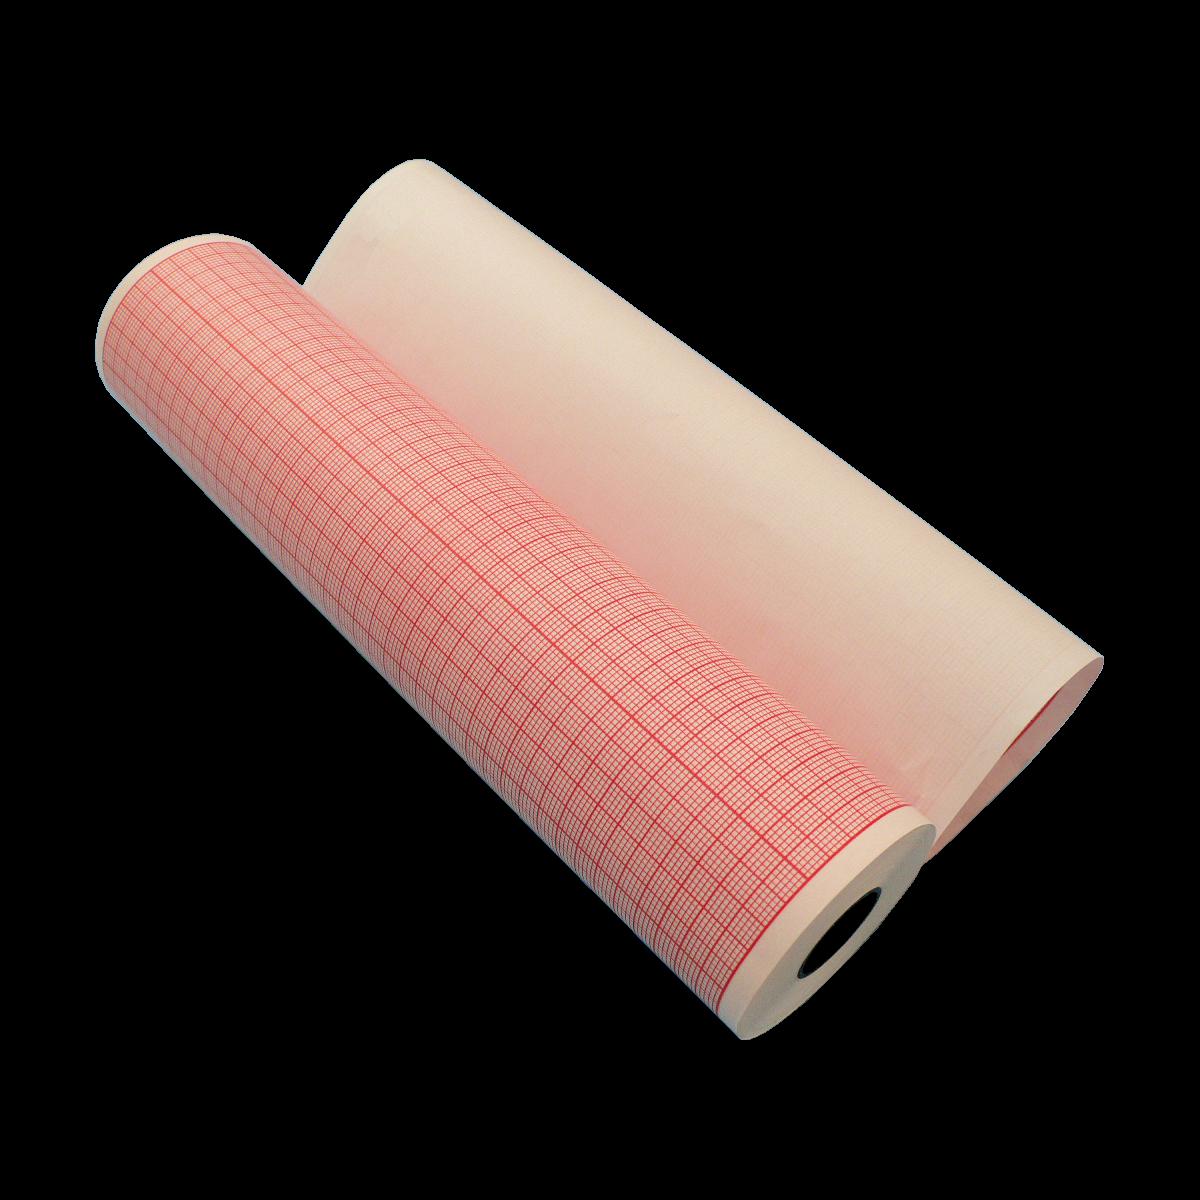 210х30х18, бумага ЭКГ для Fucuda, Nihon Kohden, Sensitec, Dixion, Medinova, реестр 4063/1